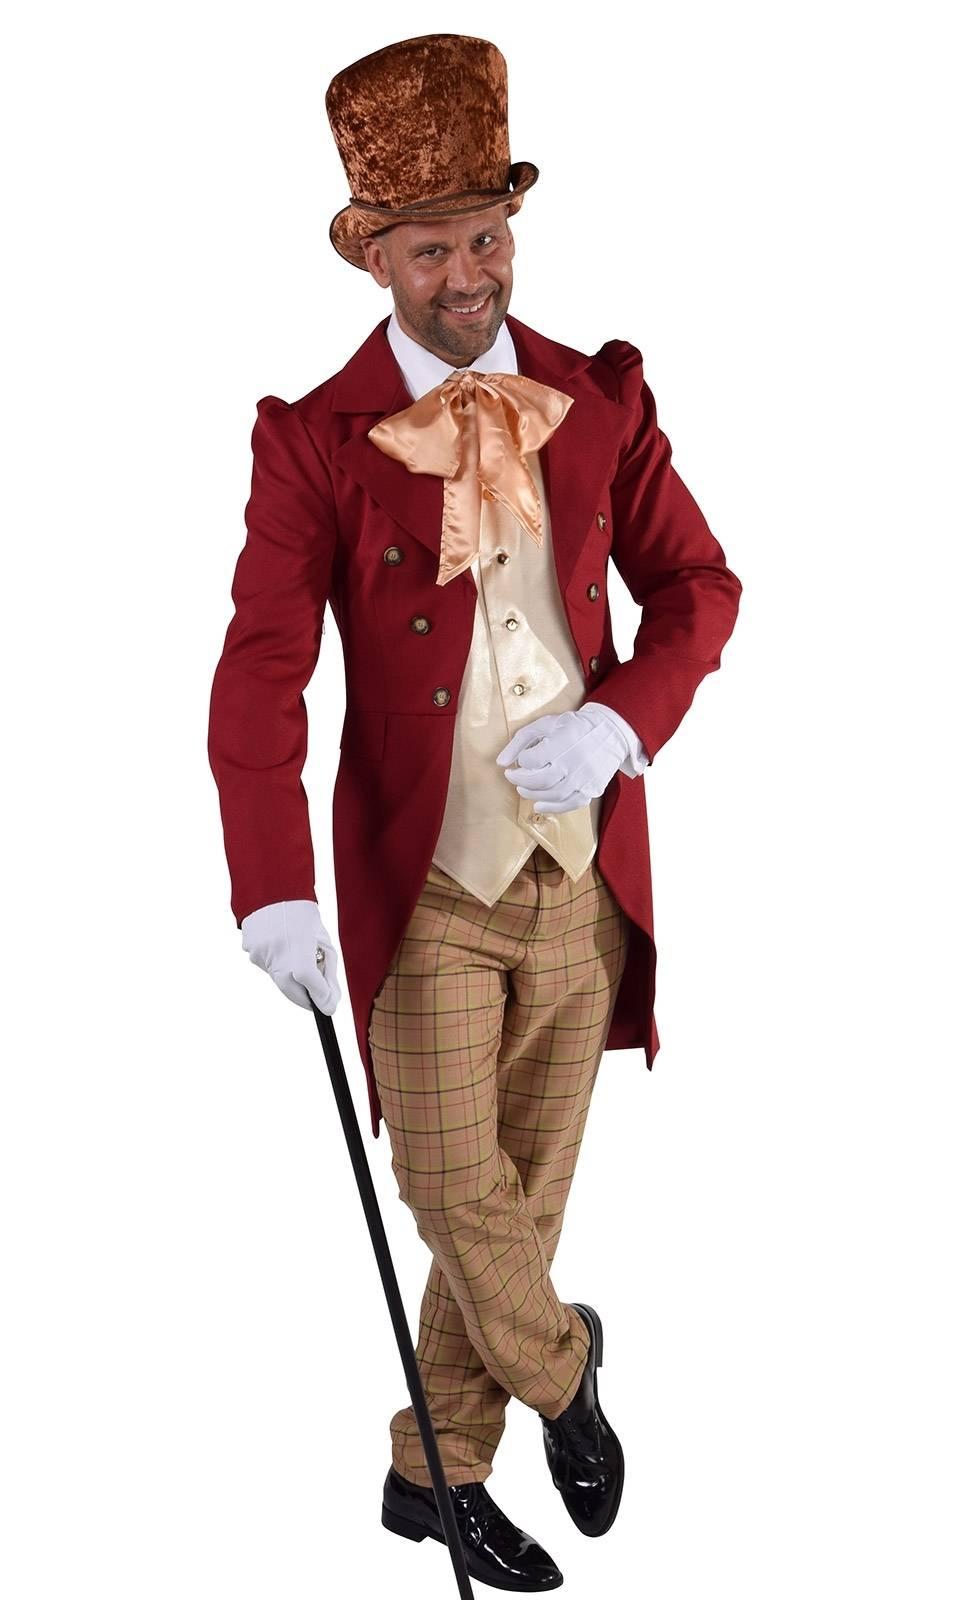 Costume-Belle-Epoque-Homme-1900-Grande-Taille-2